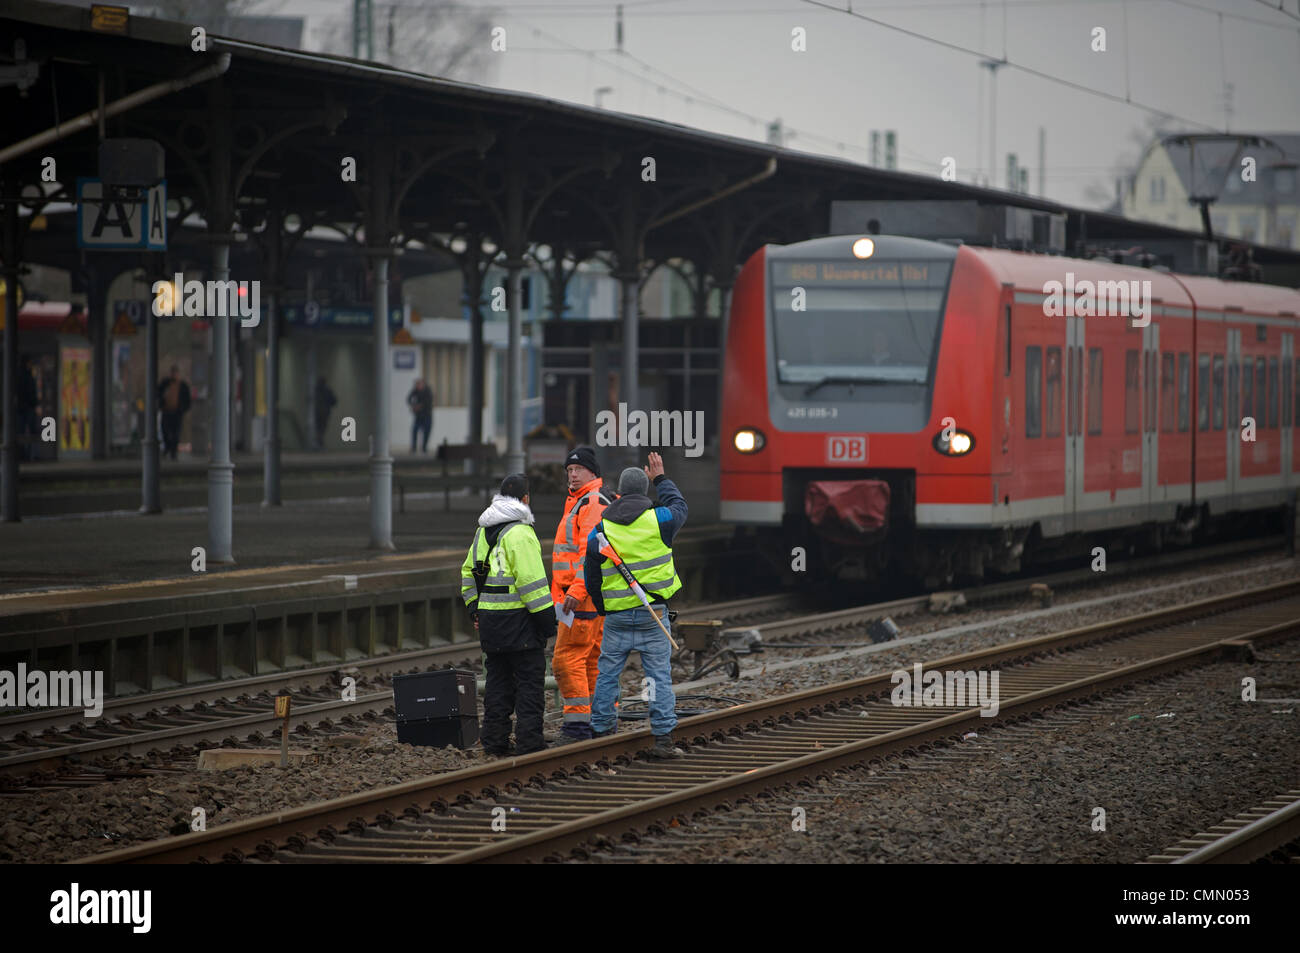 Rail engineers working on trackside signals, Solingen, North Rhine-Westphalia, Germany. Stock Photo